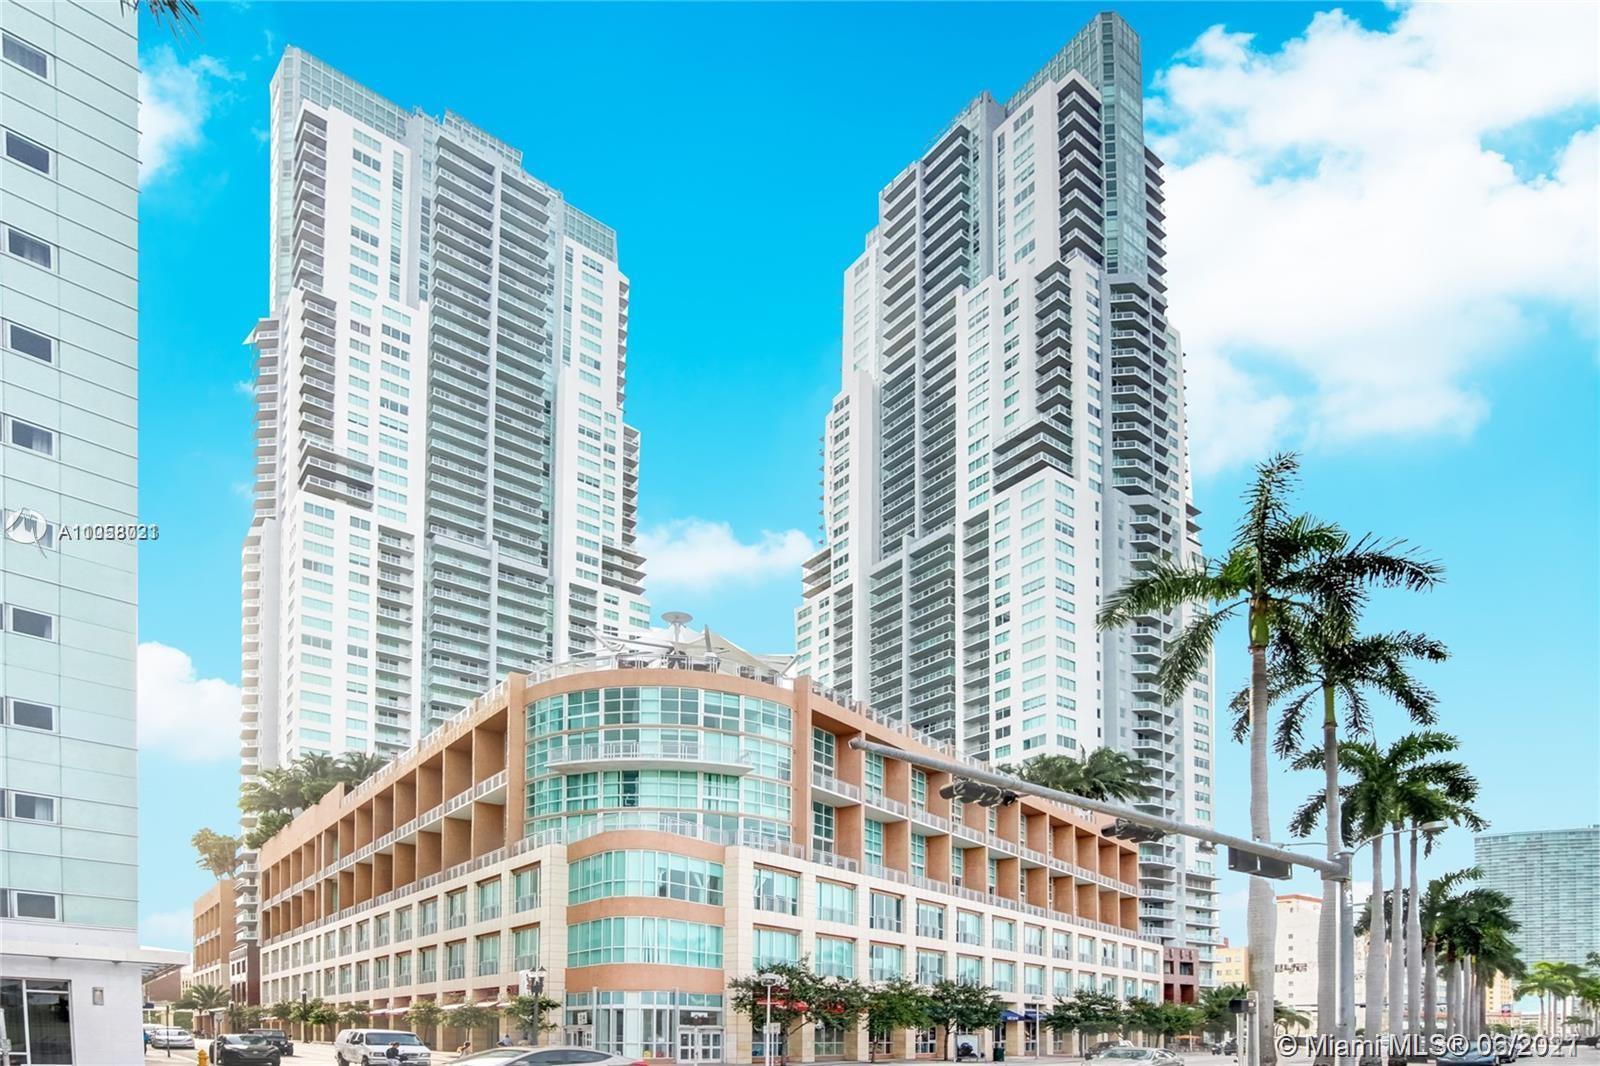 Vizcayne One #4707 - 244 Biscayne Blvd #4707, Miami, FL 33132